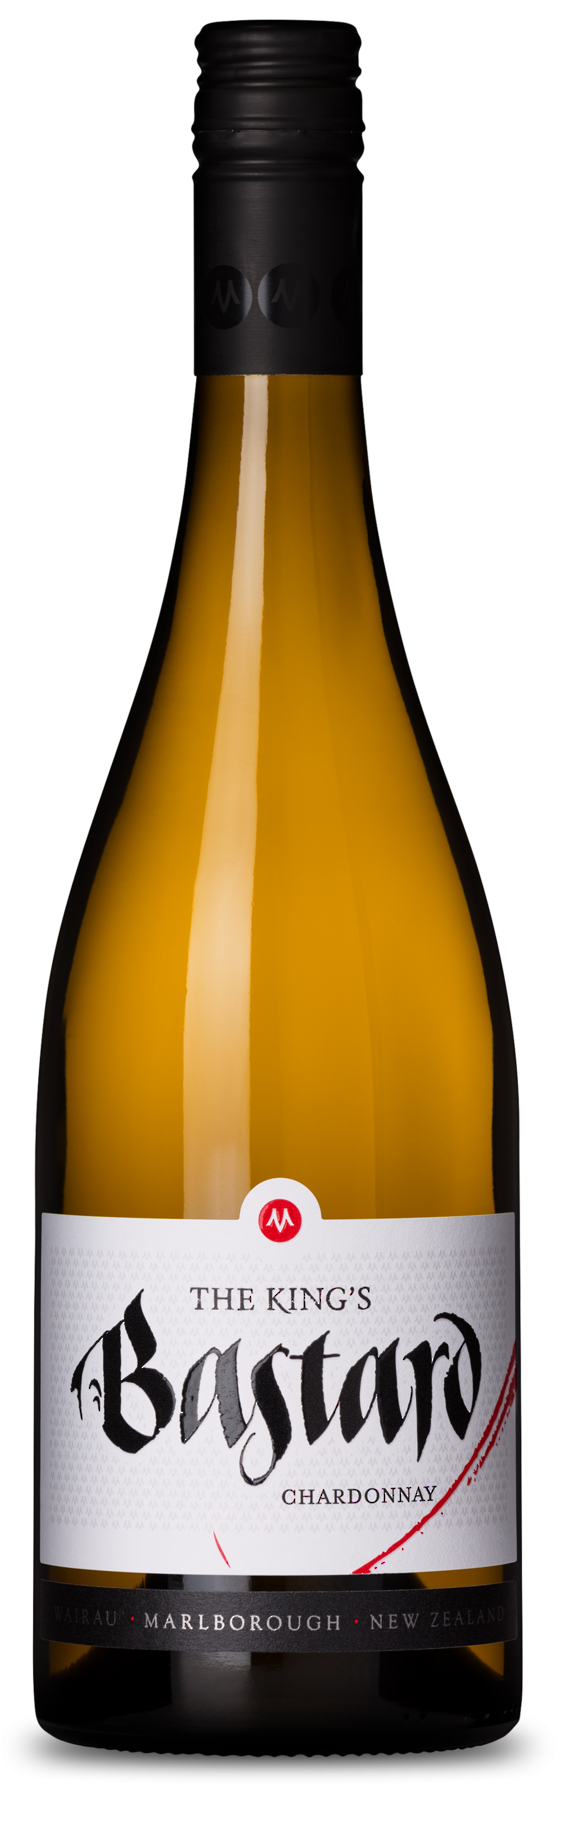 The King's Bastard Chardonnay 2019 image 0